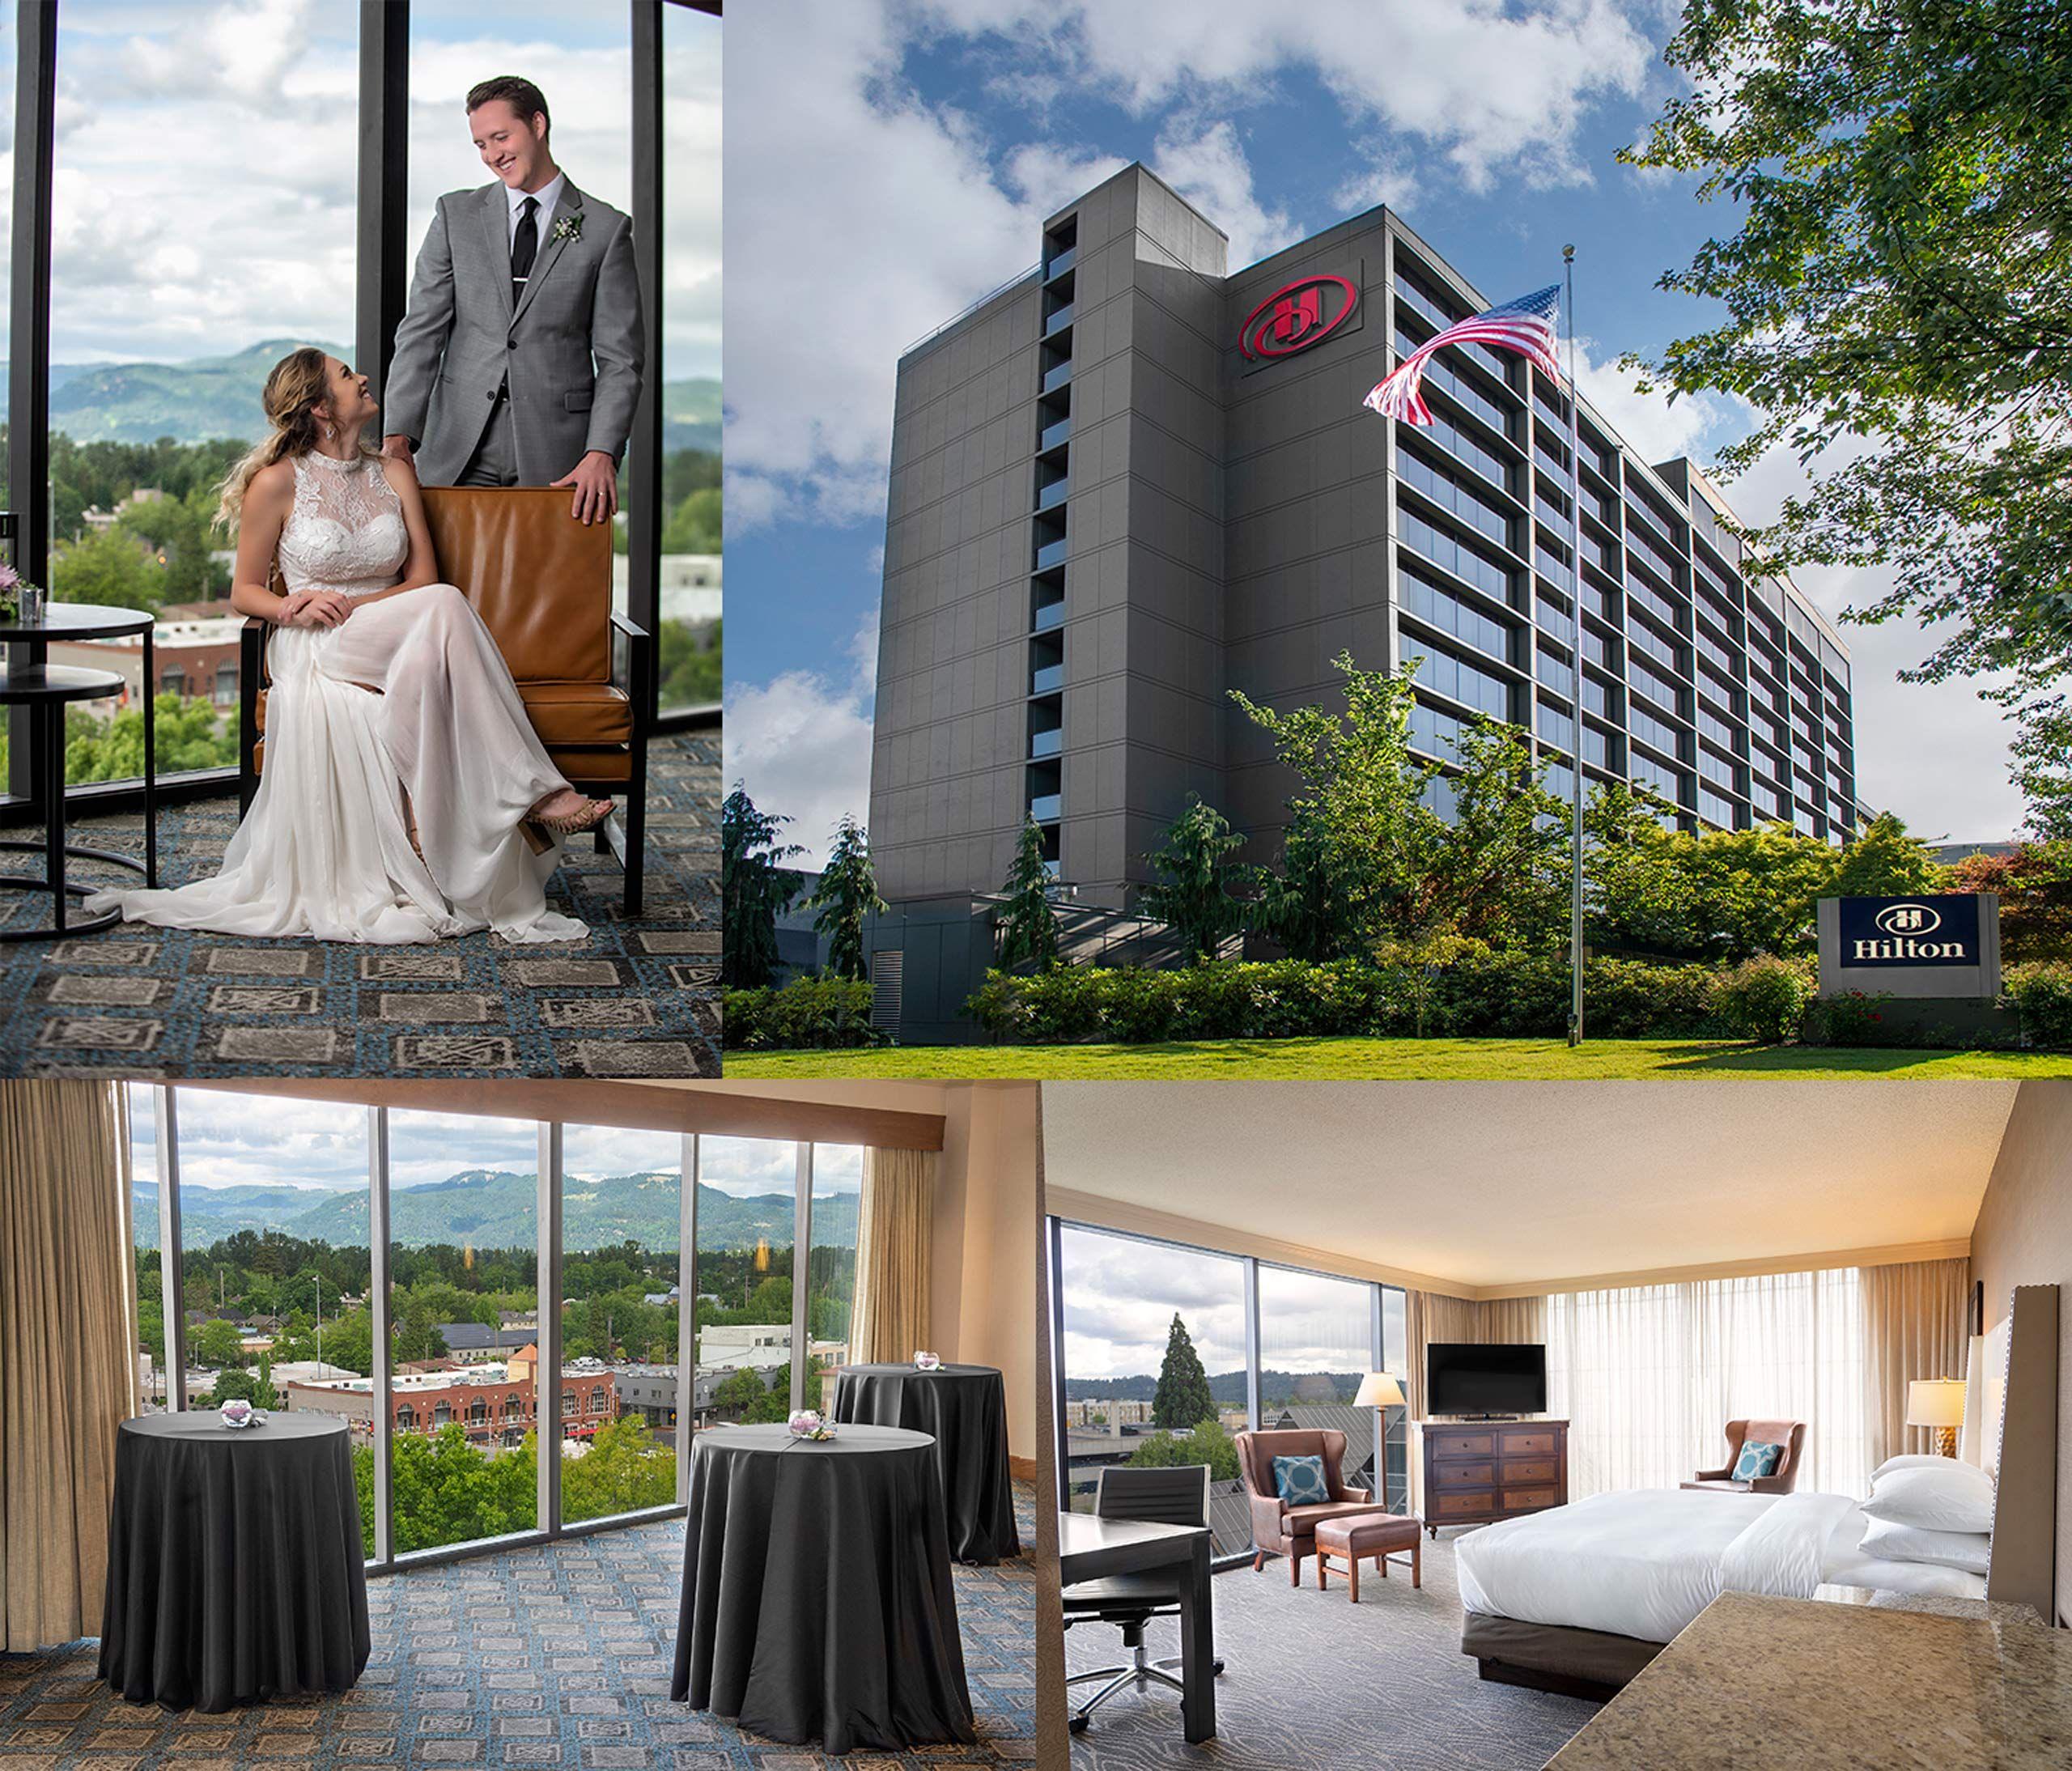 The Hilton Eugene